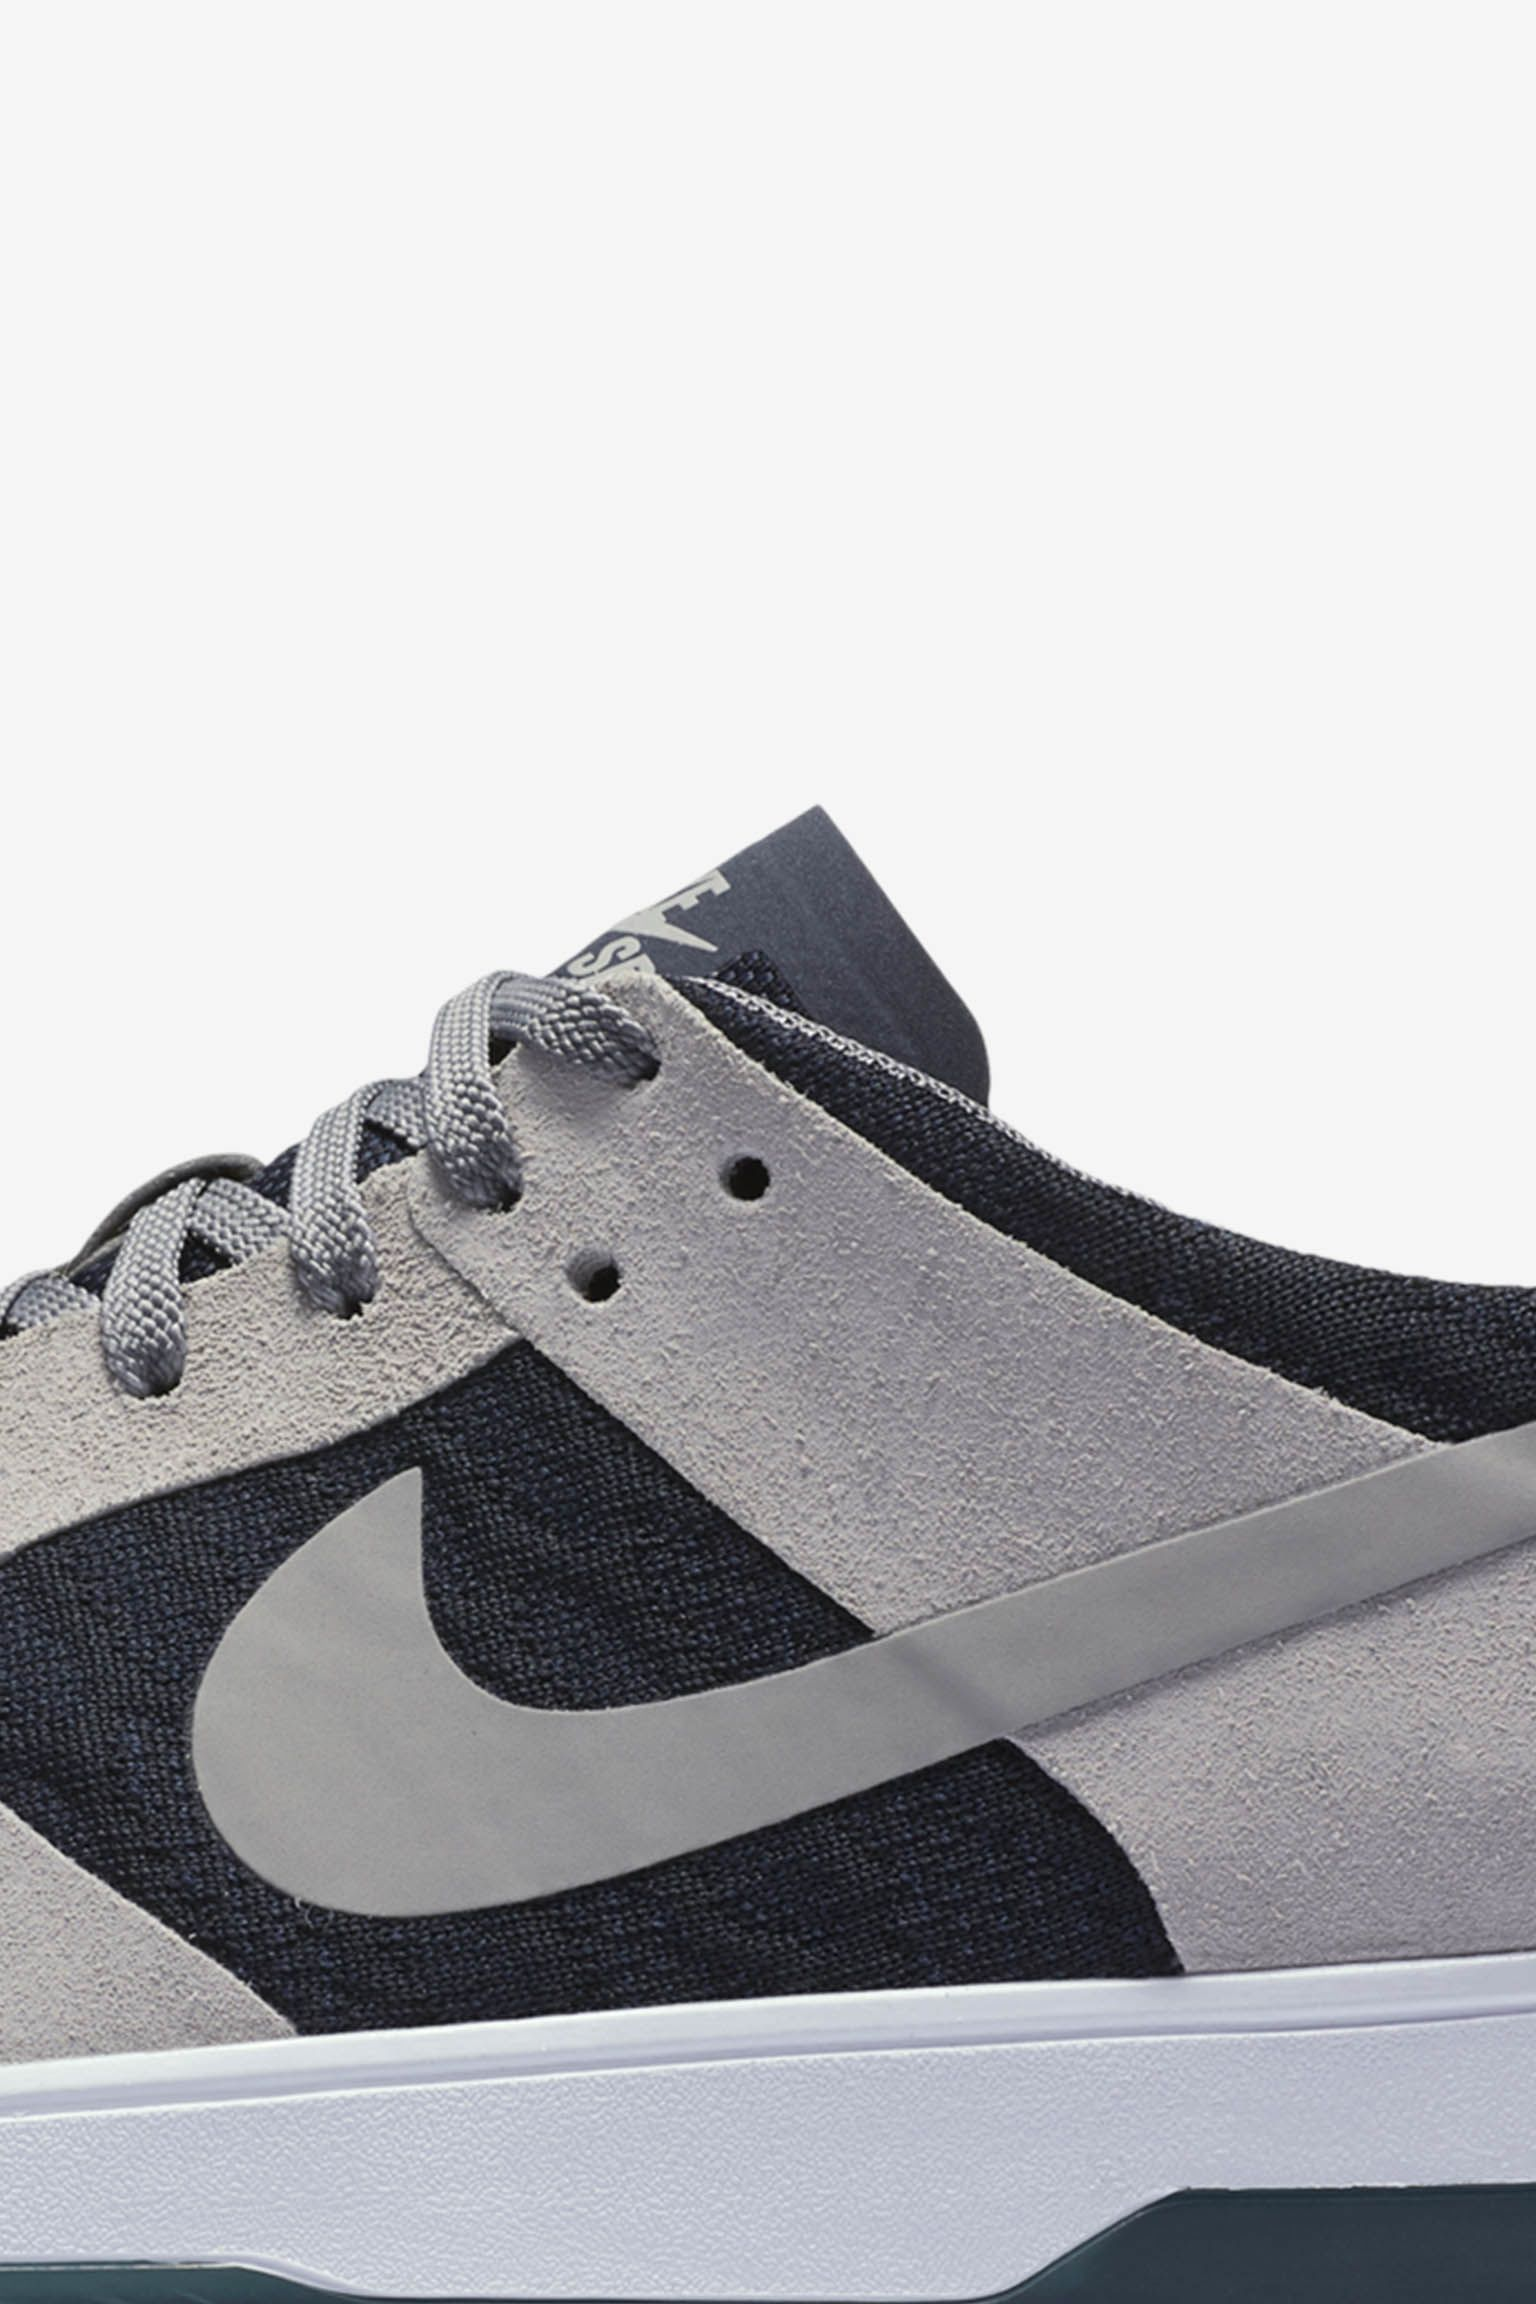 Nike SB Dunk Low Elite 'Medium Grey & Dark Obsidian'